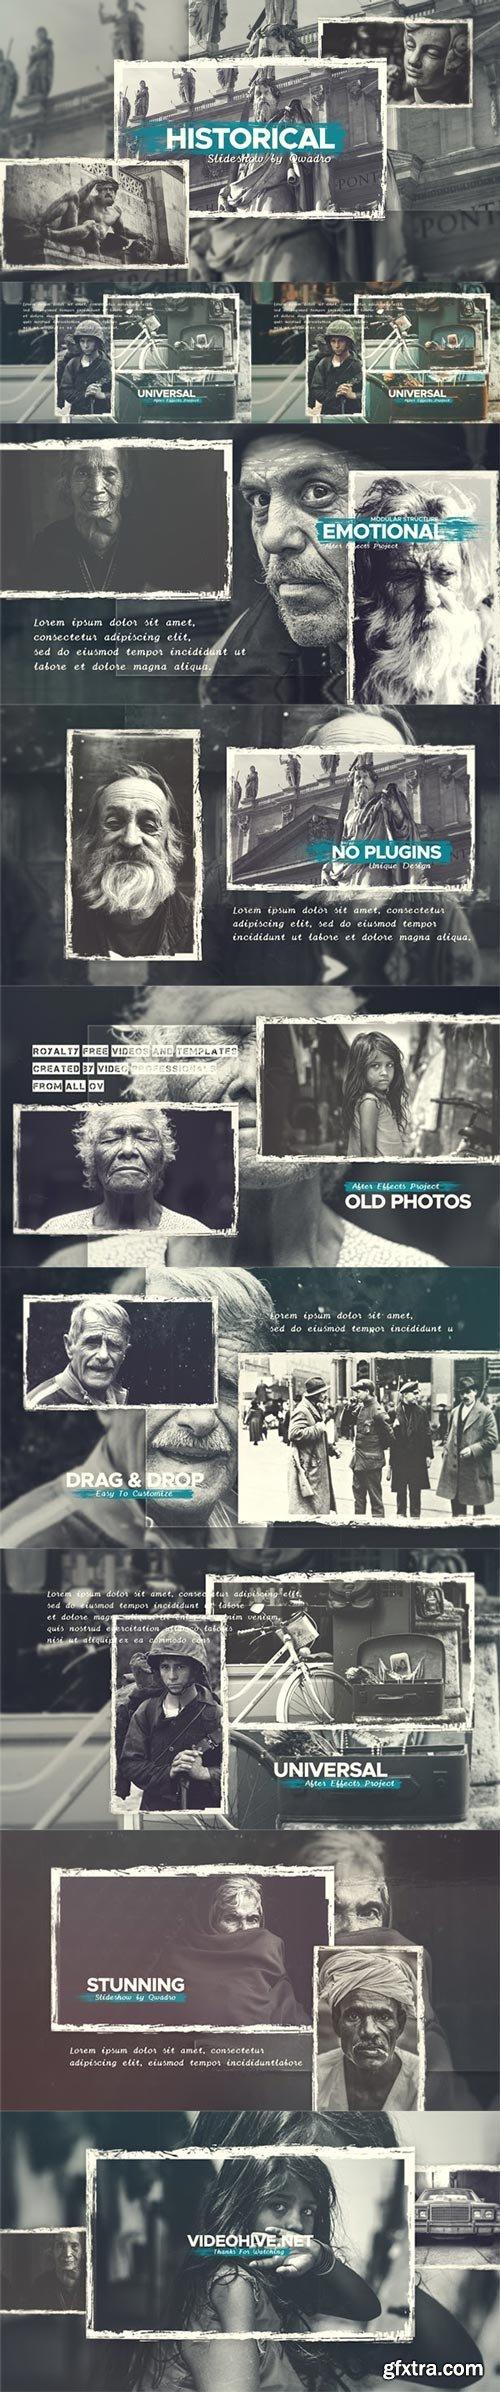 Videohive - Historical Vintage Documentary Slideshow - 21783704